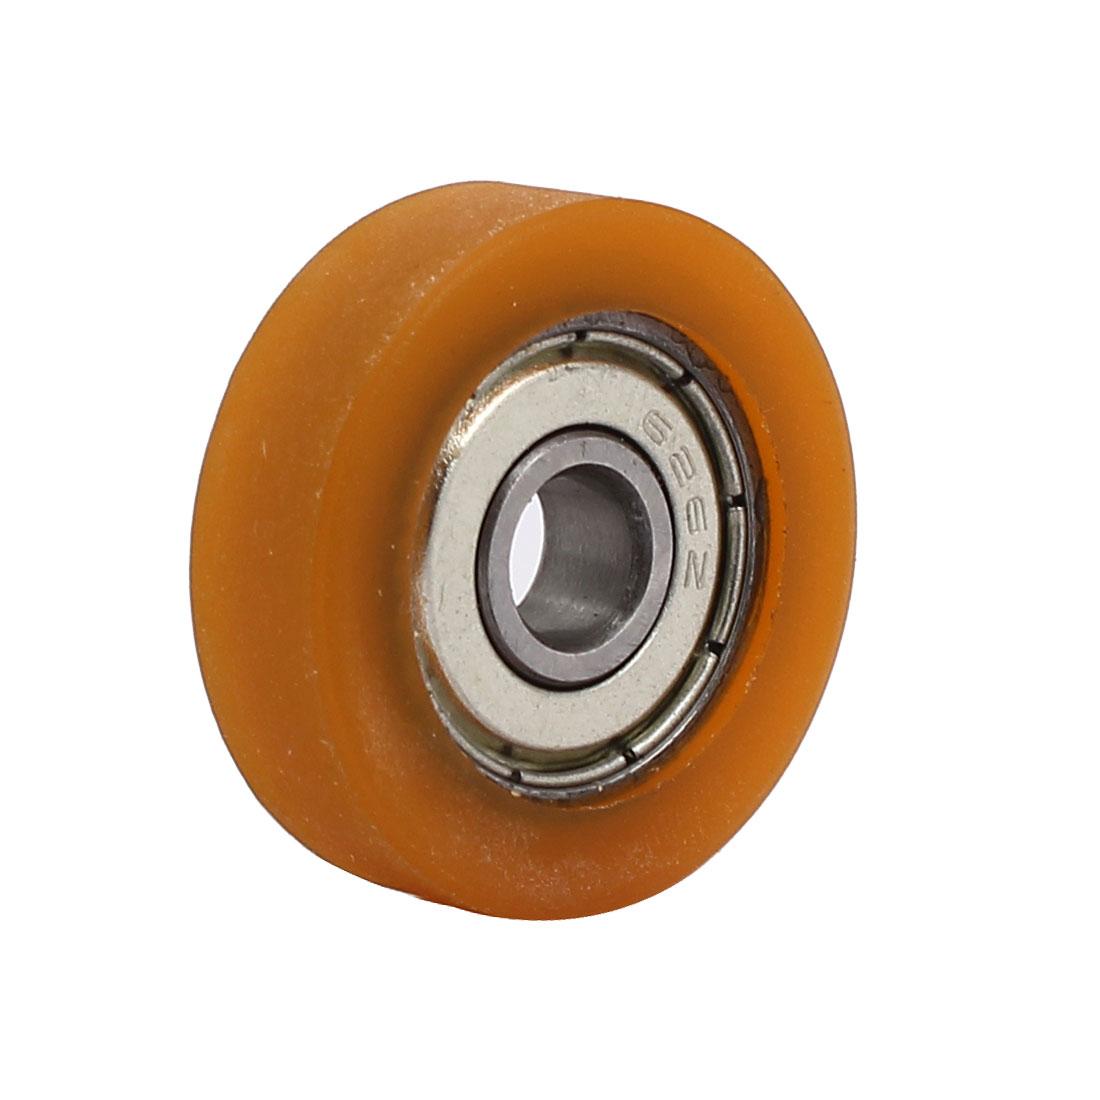 6mm x 26mm x 8mm PU Roller Bearing Pulley Sliding Converyor Wheel